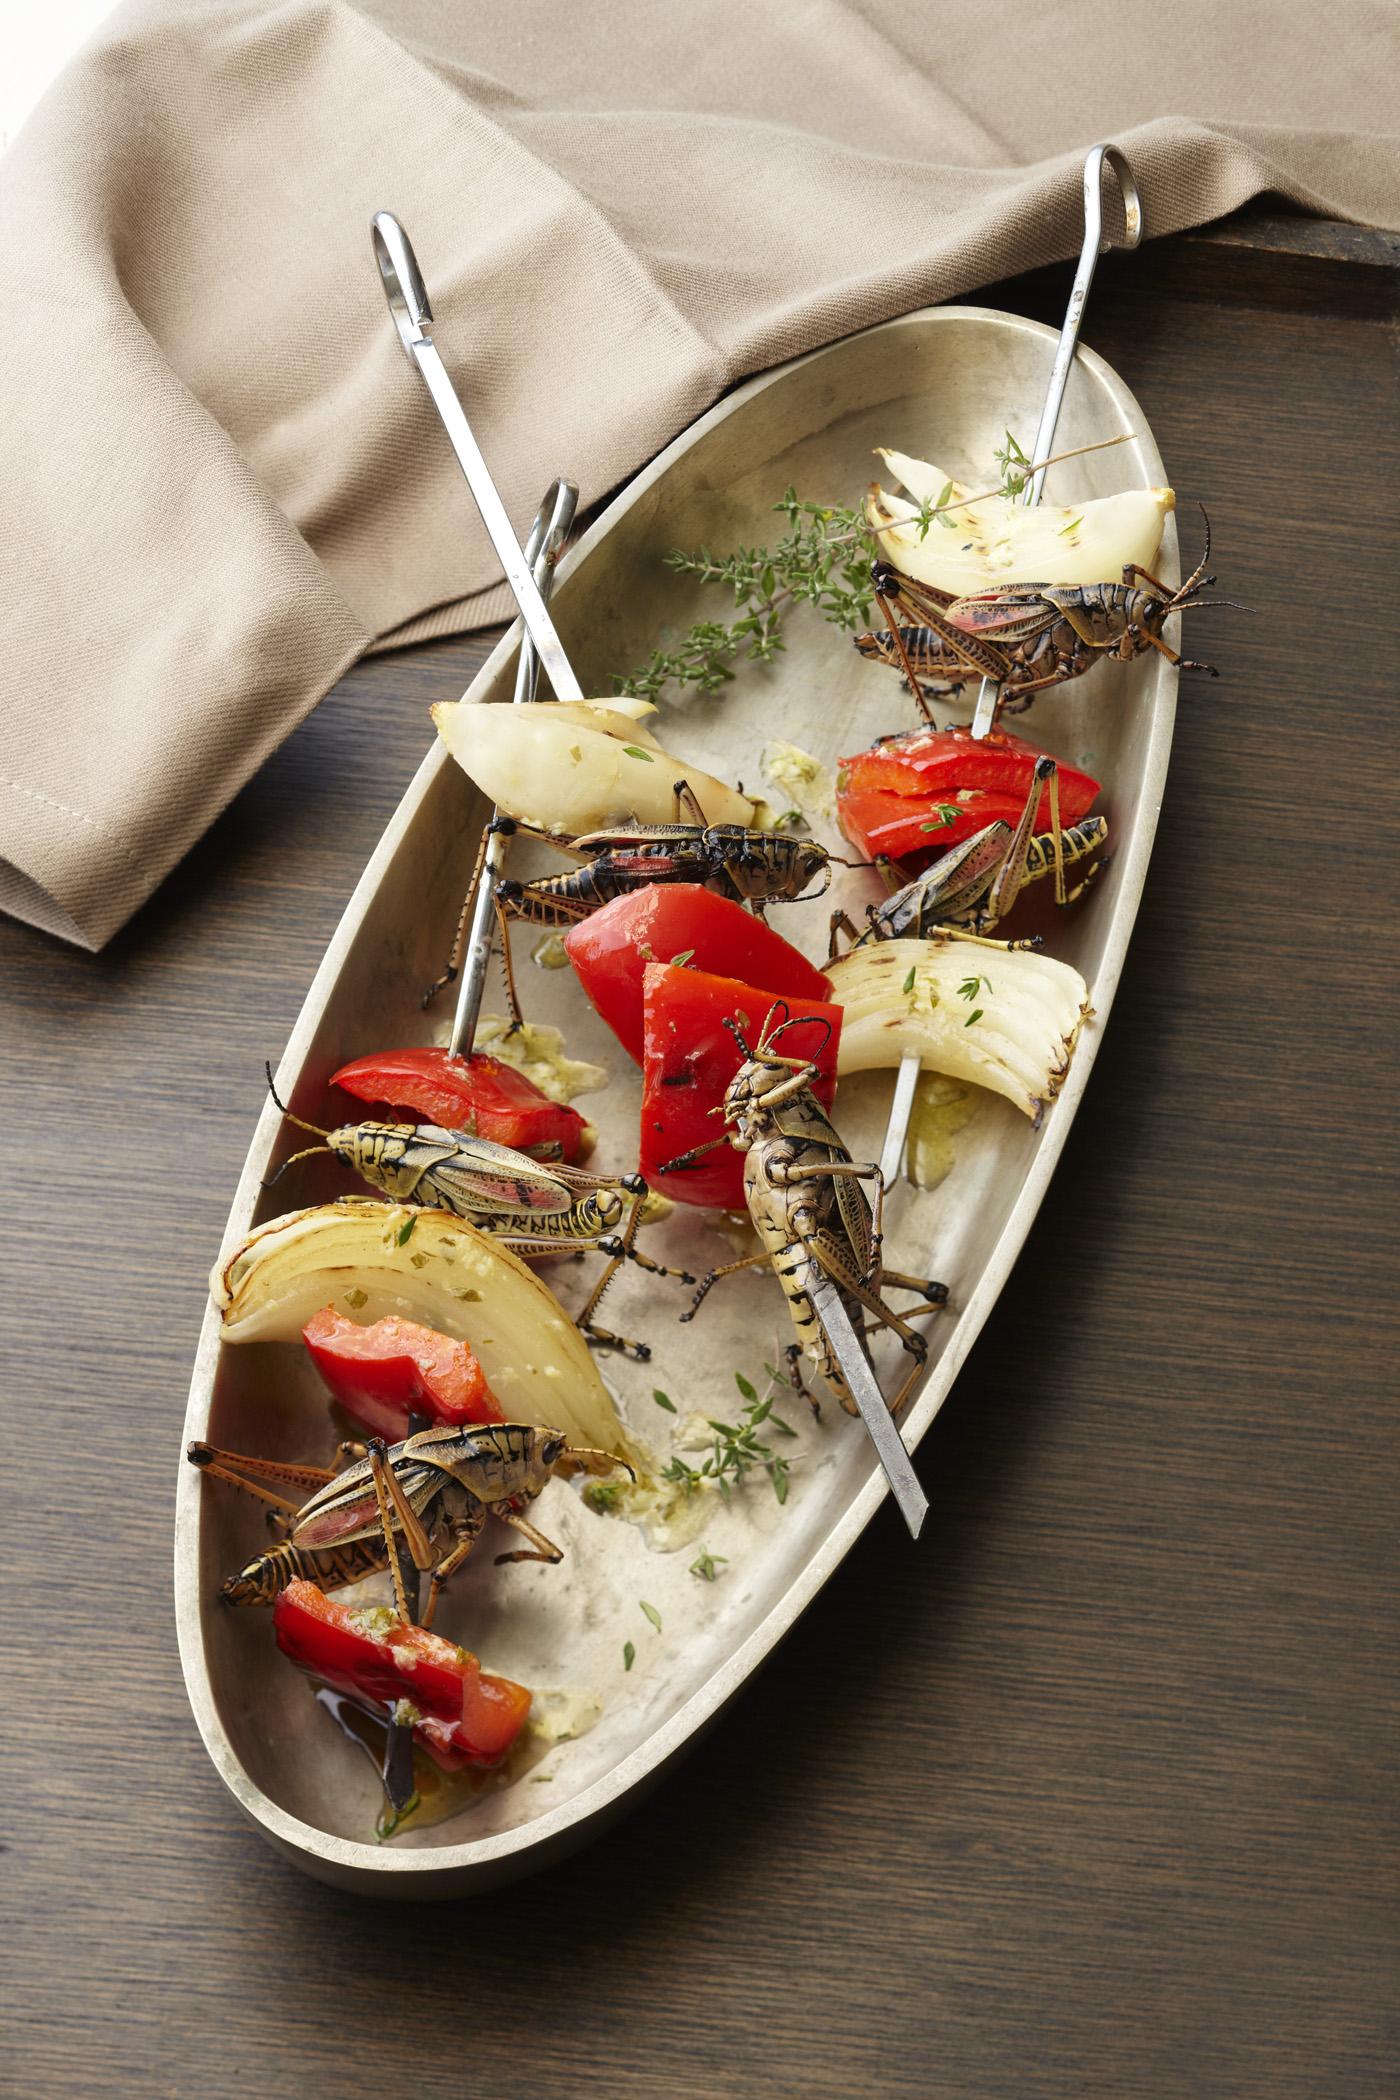 Fullsize Of What Do Crickets Eat